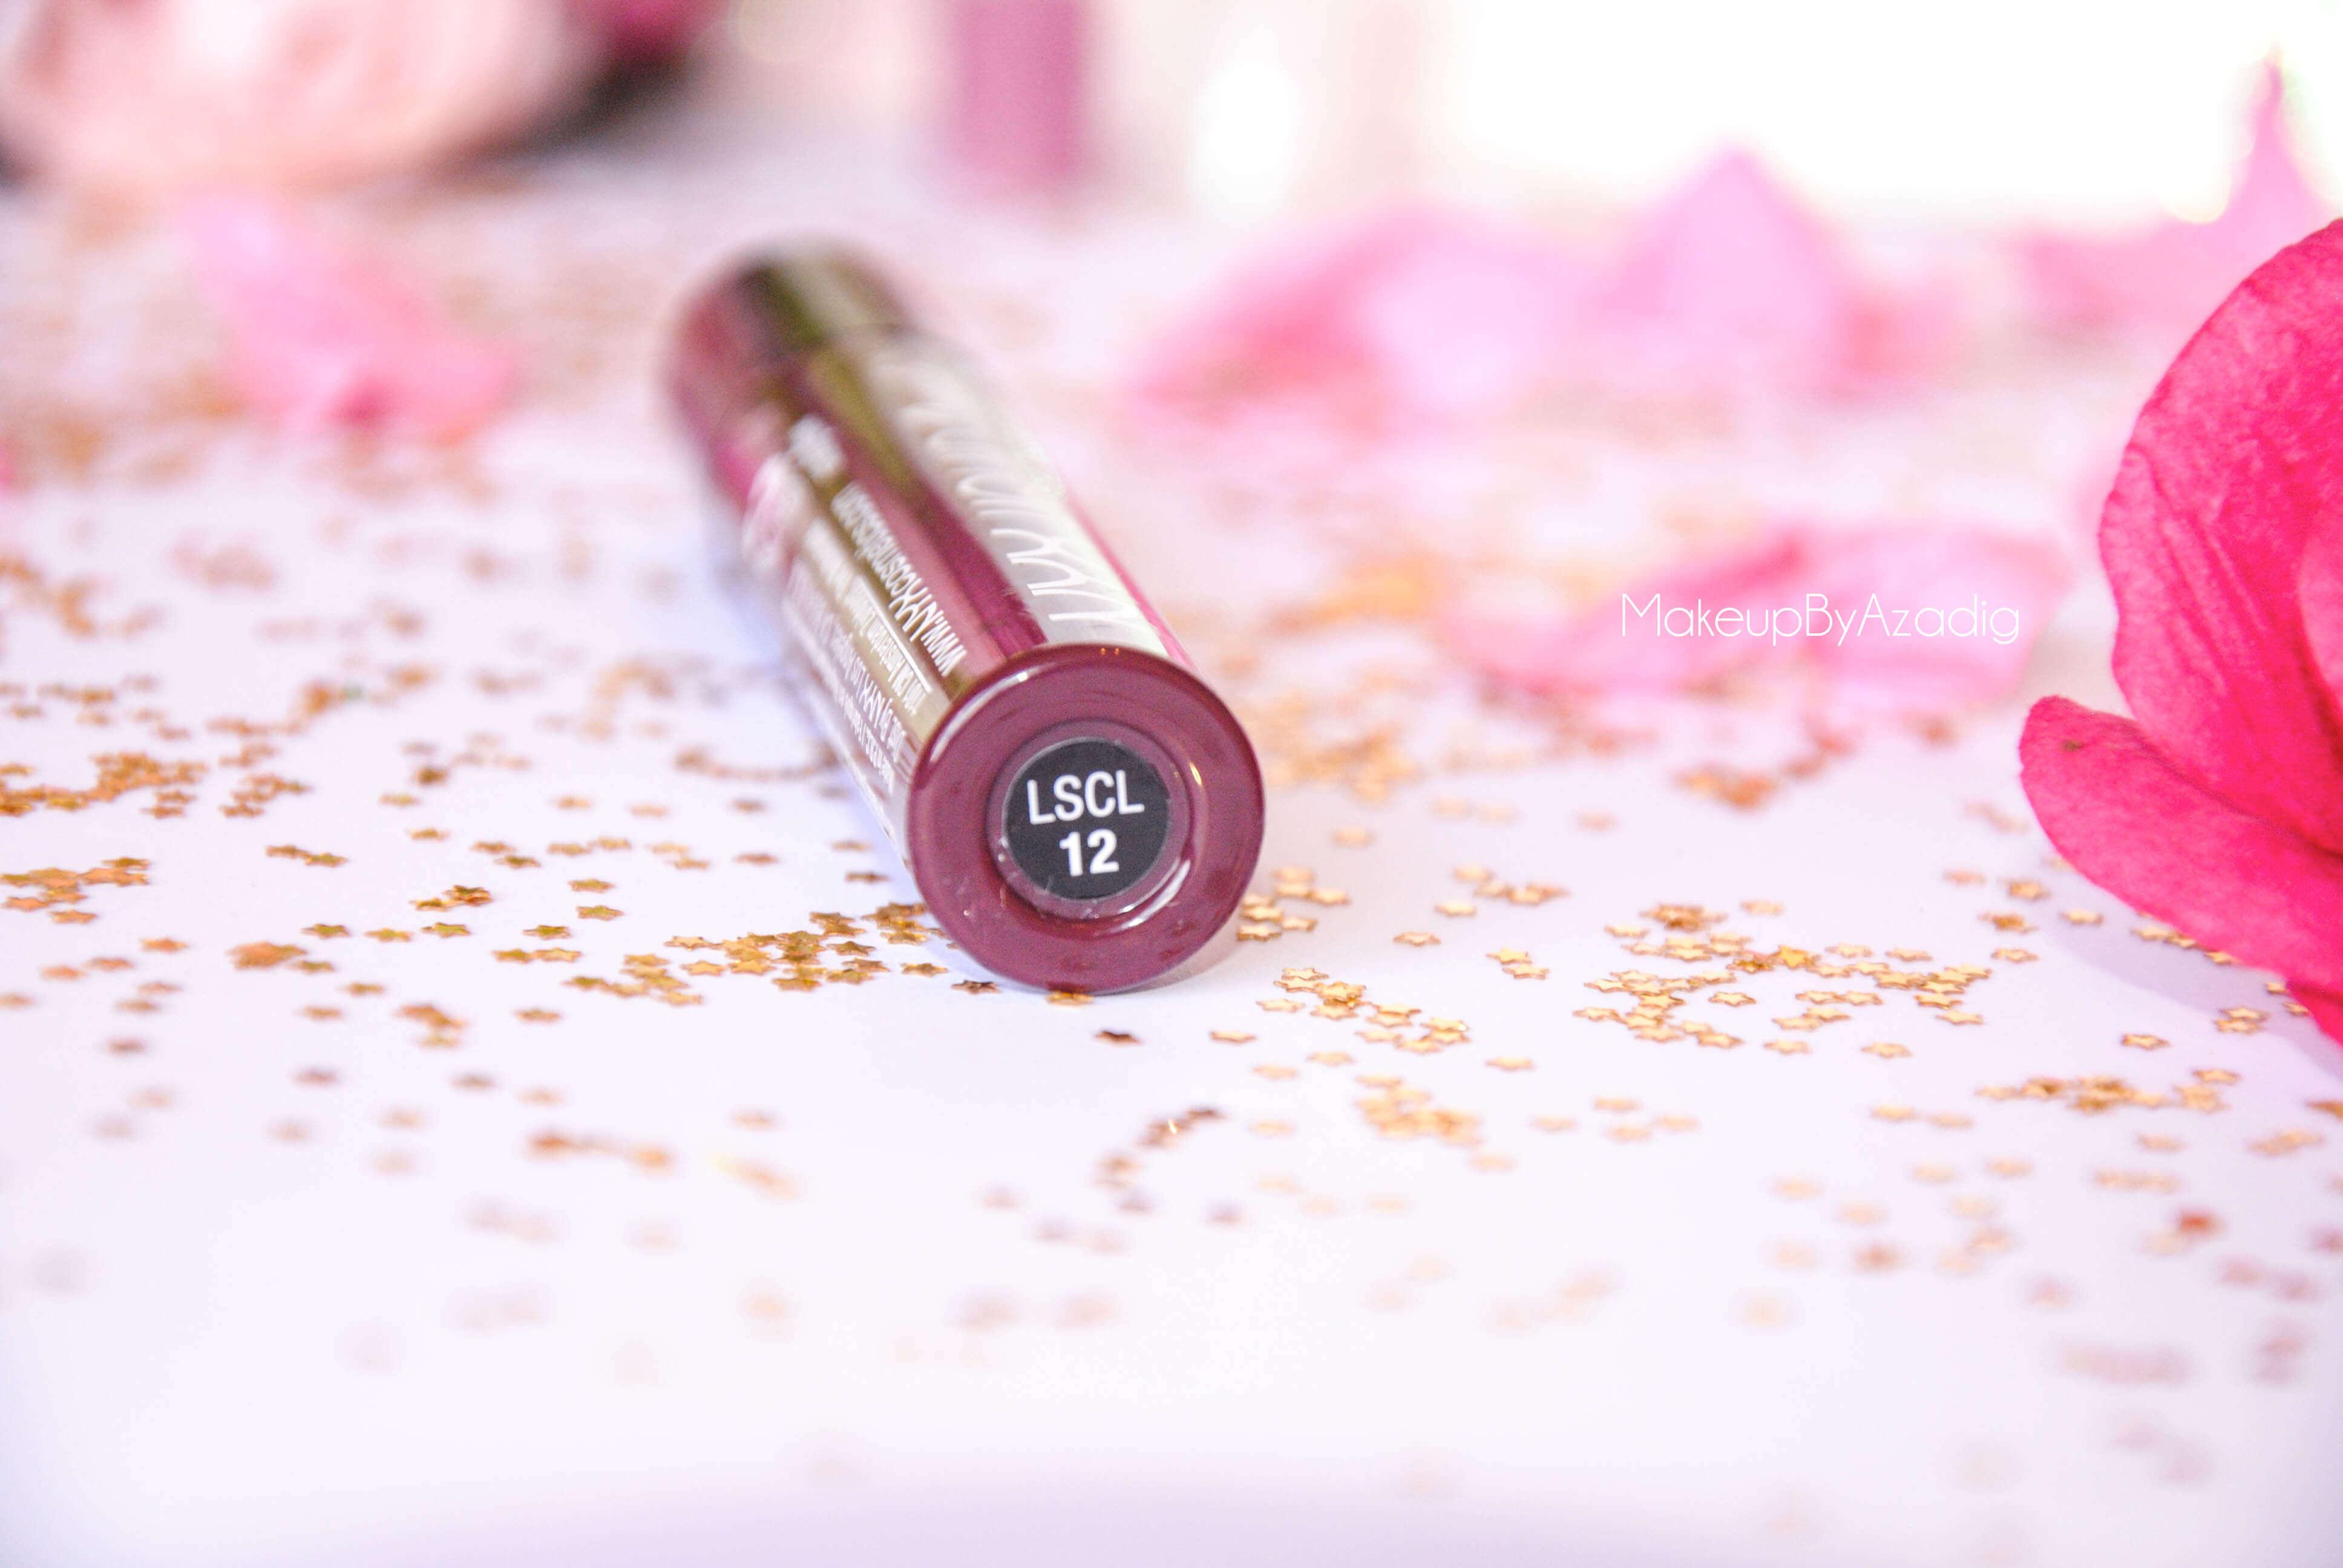 liquid suede-makeupbyazadig-swatch-nyx-cosmetics-pink lust-sway-stone fox-soft spoken-orange cunty-sandstorm-amethyst-lipstick-sway-cherry skies-vintage-color